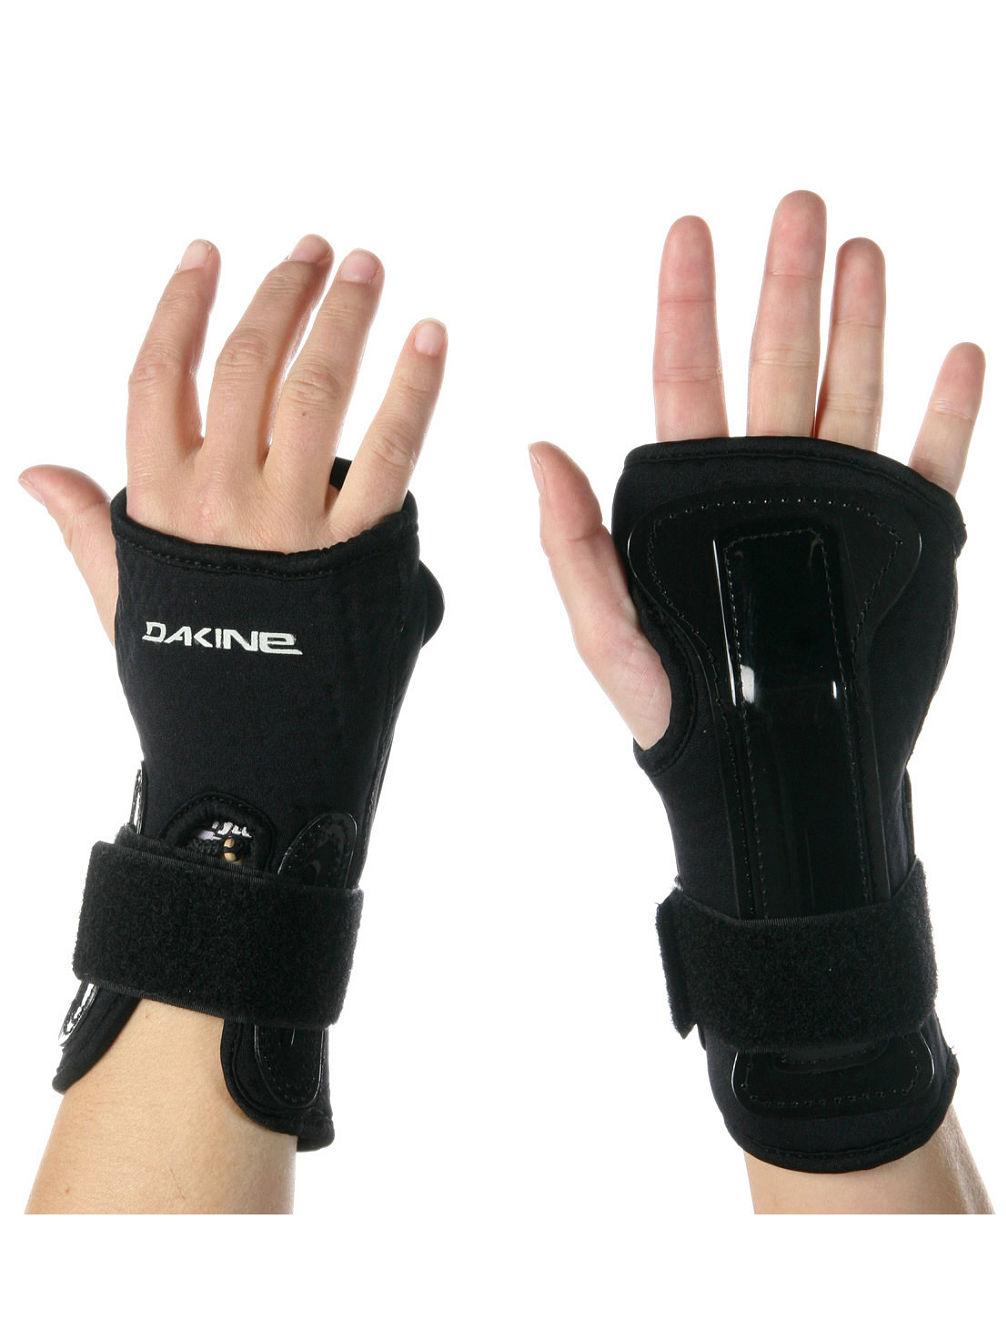 Buy Dakine Wrist Guard online at blue-tomato.com